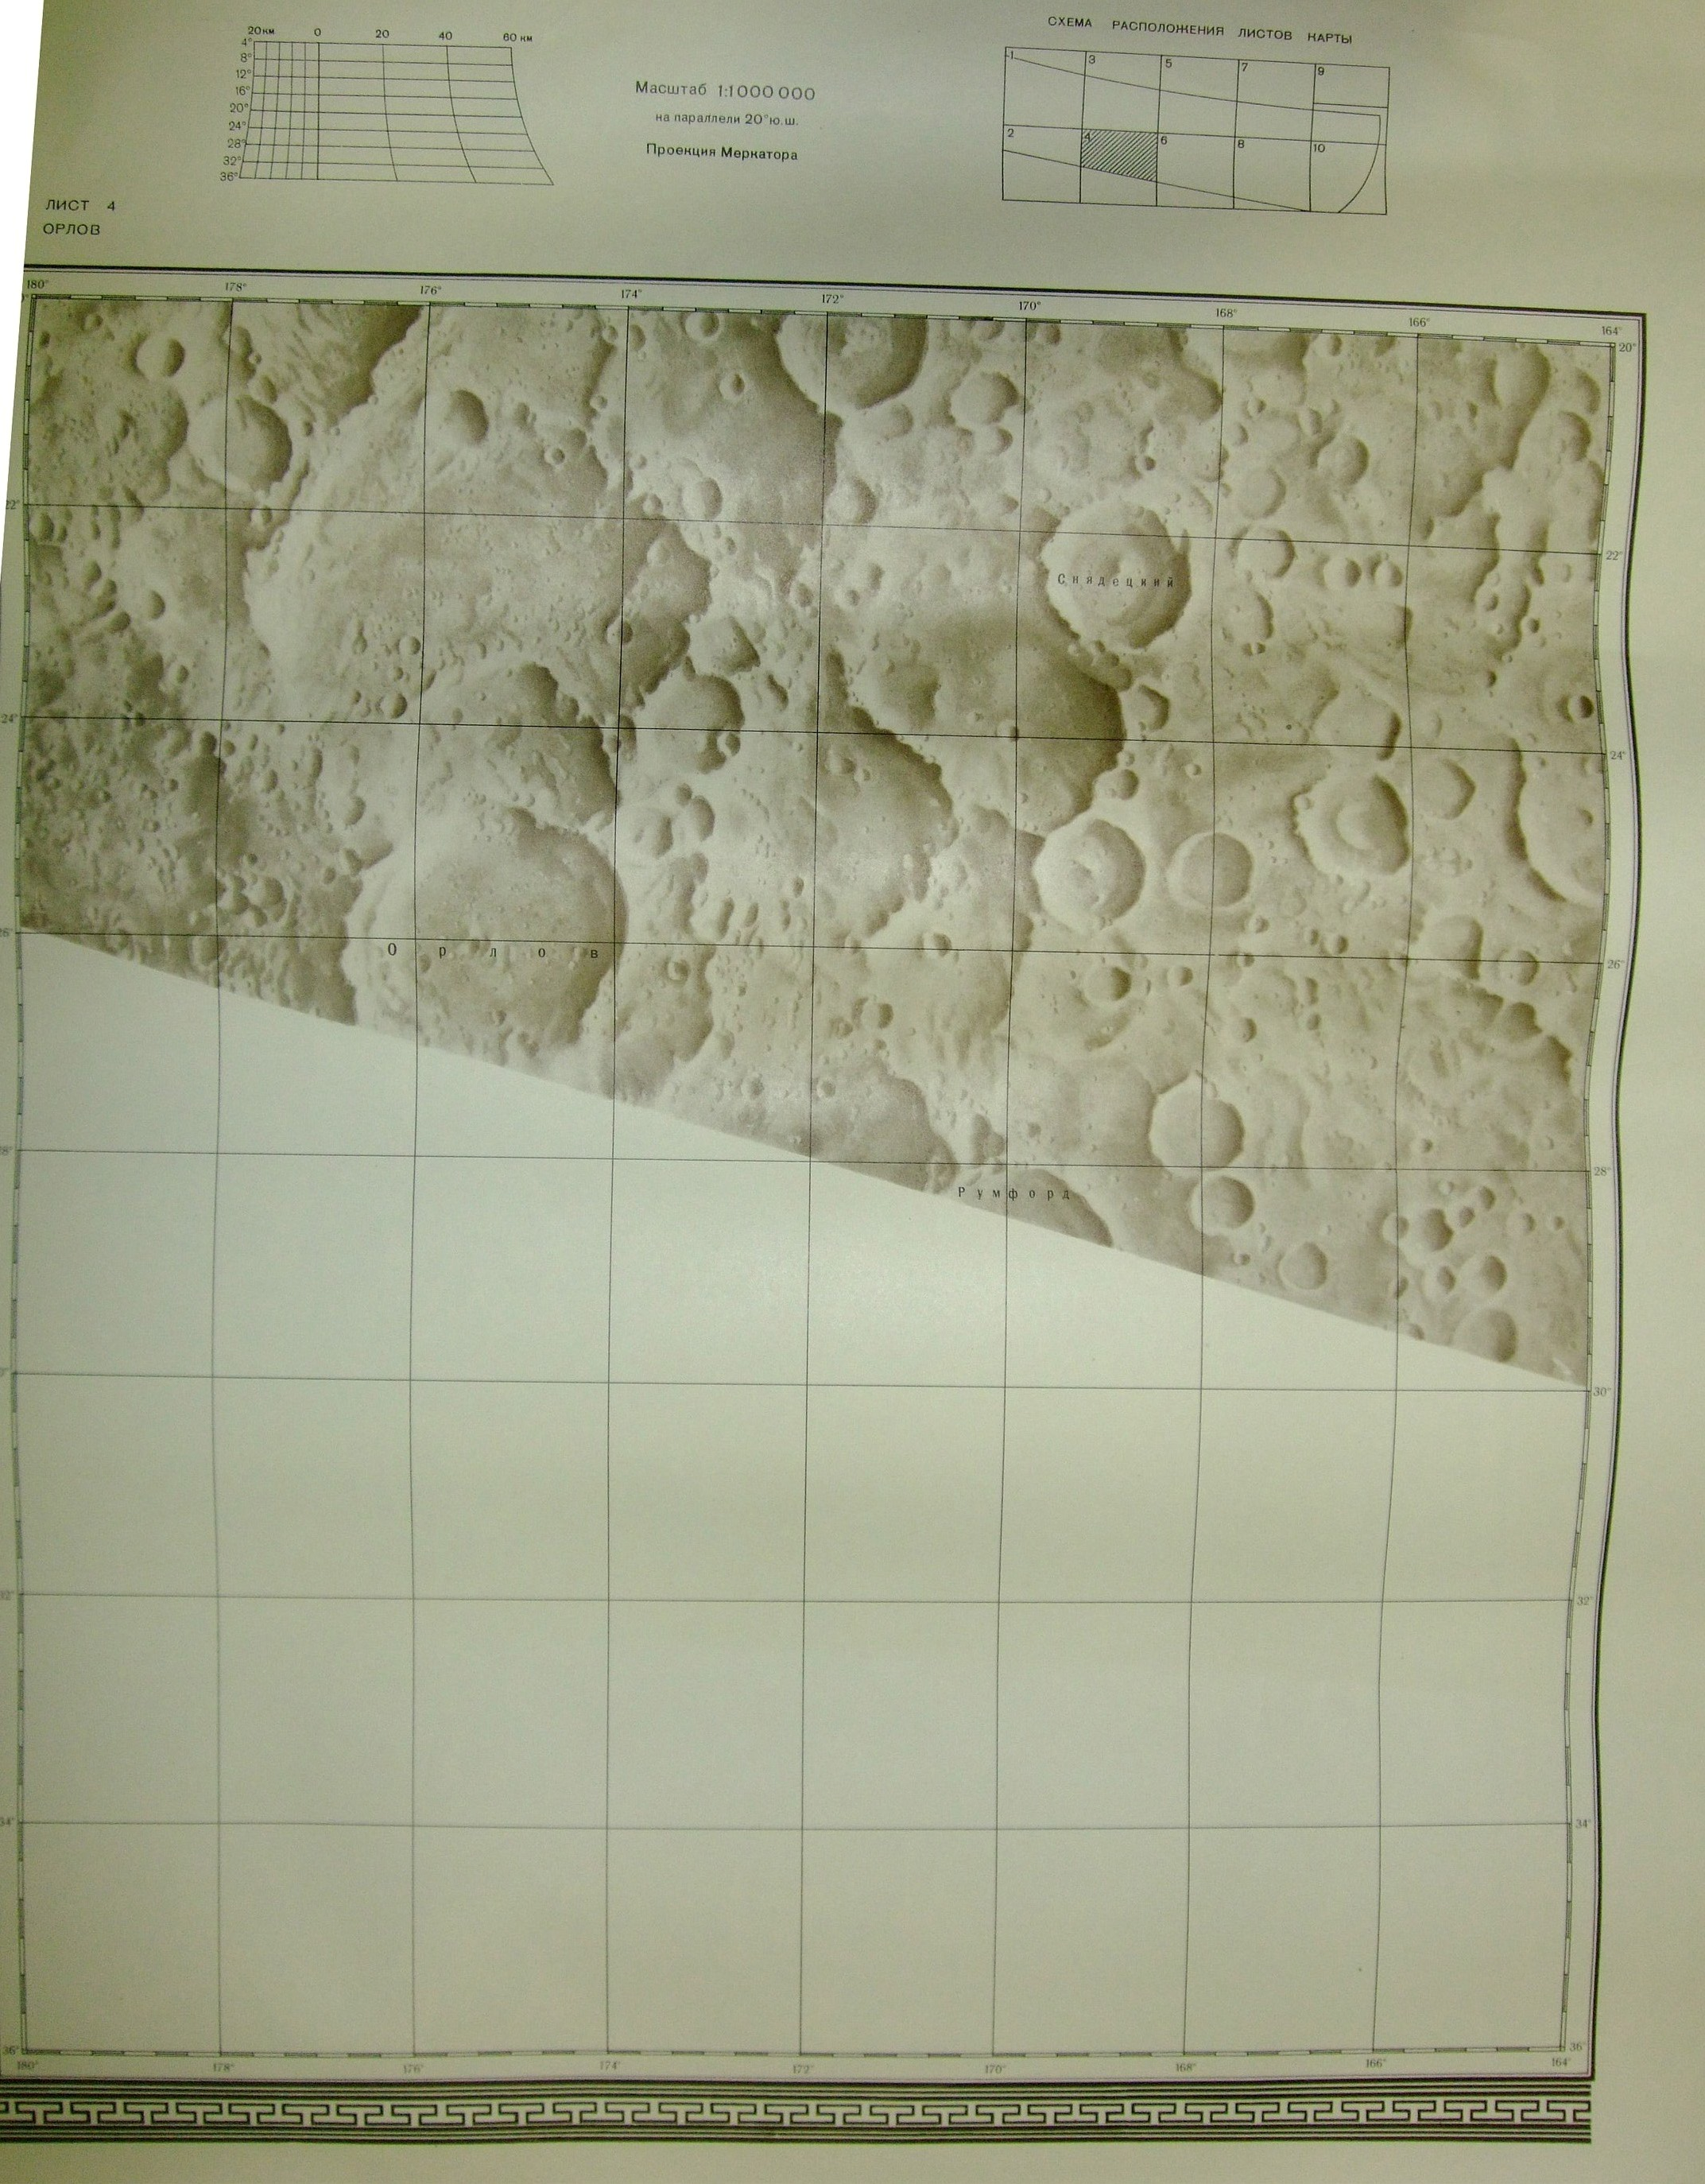 zond-8_moon_map_5